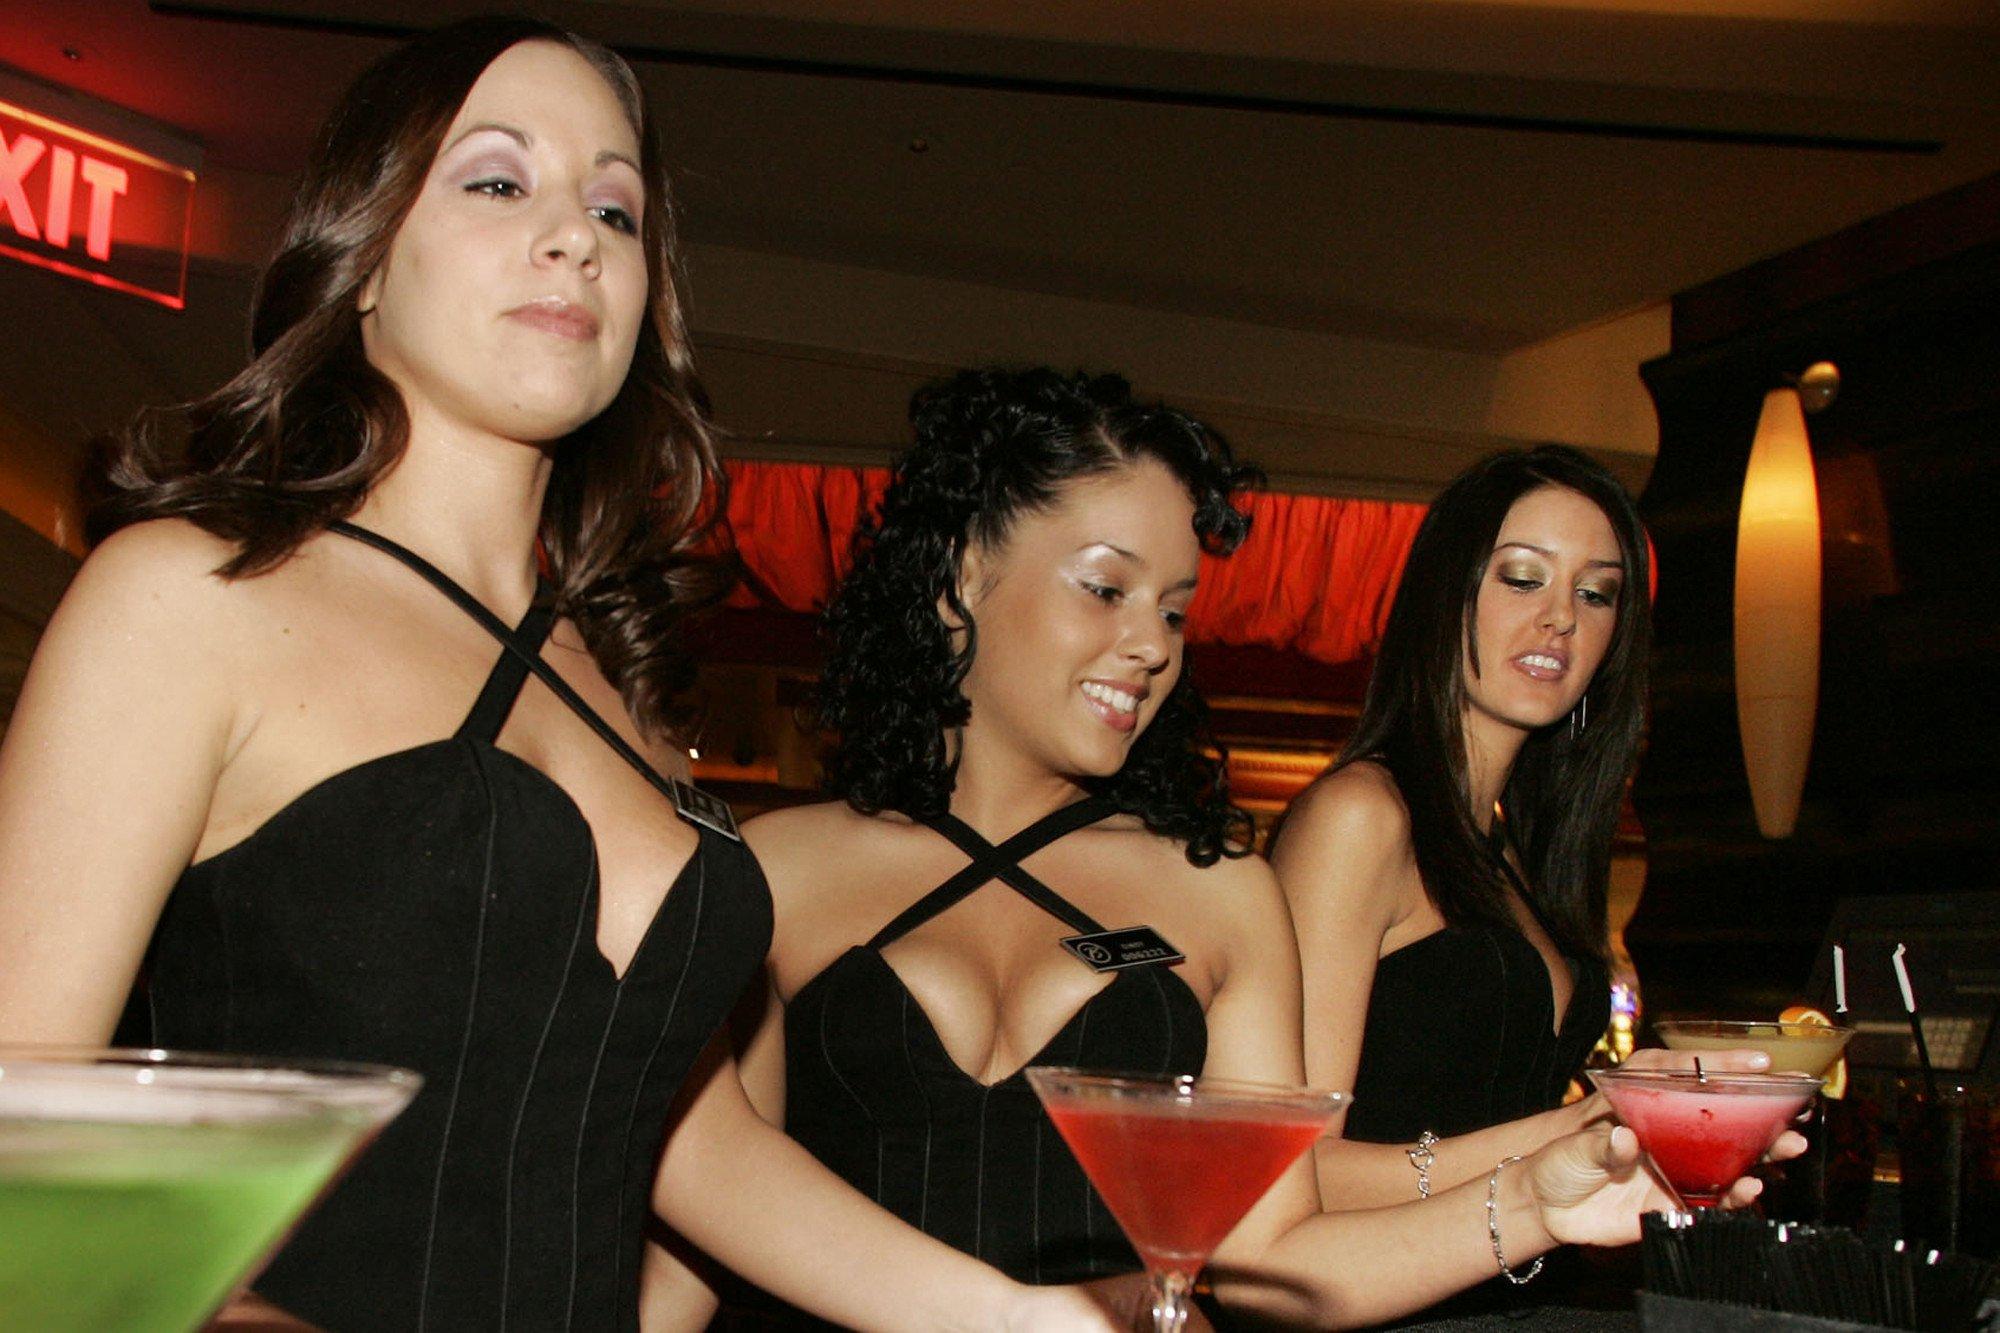 Las Vegas union strike sexual harassment